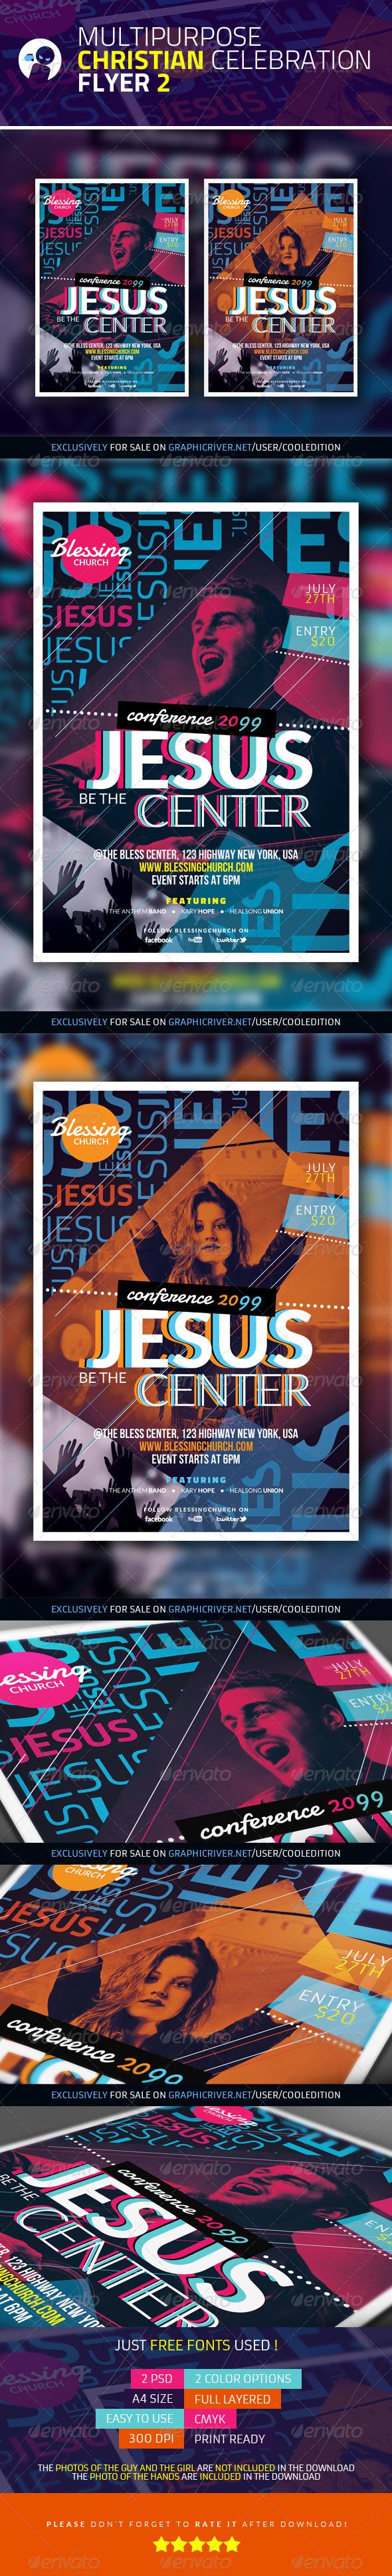 14 church event flyer psd images free psd church flyer.html